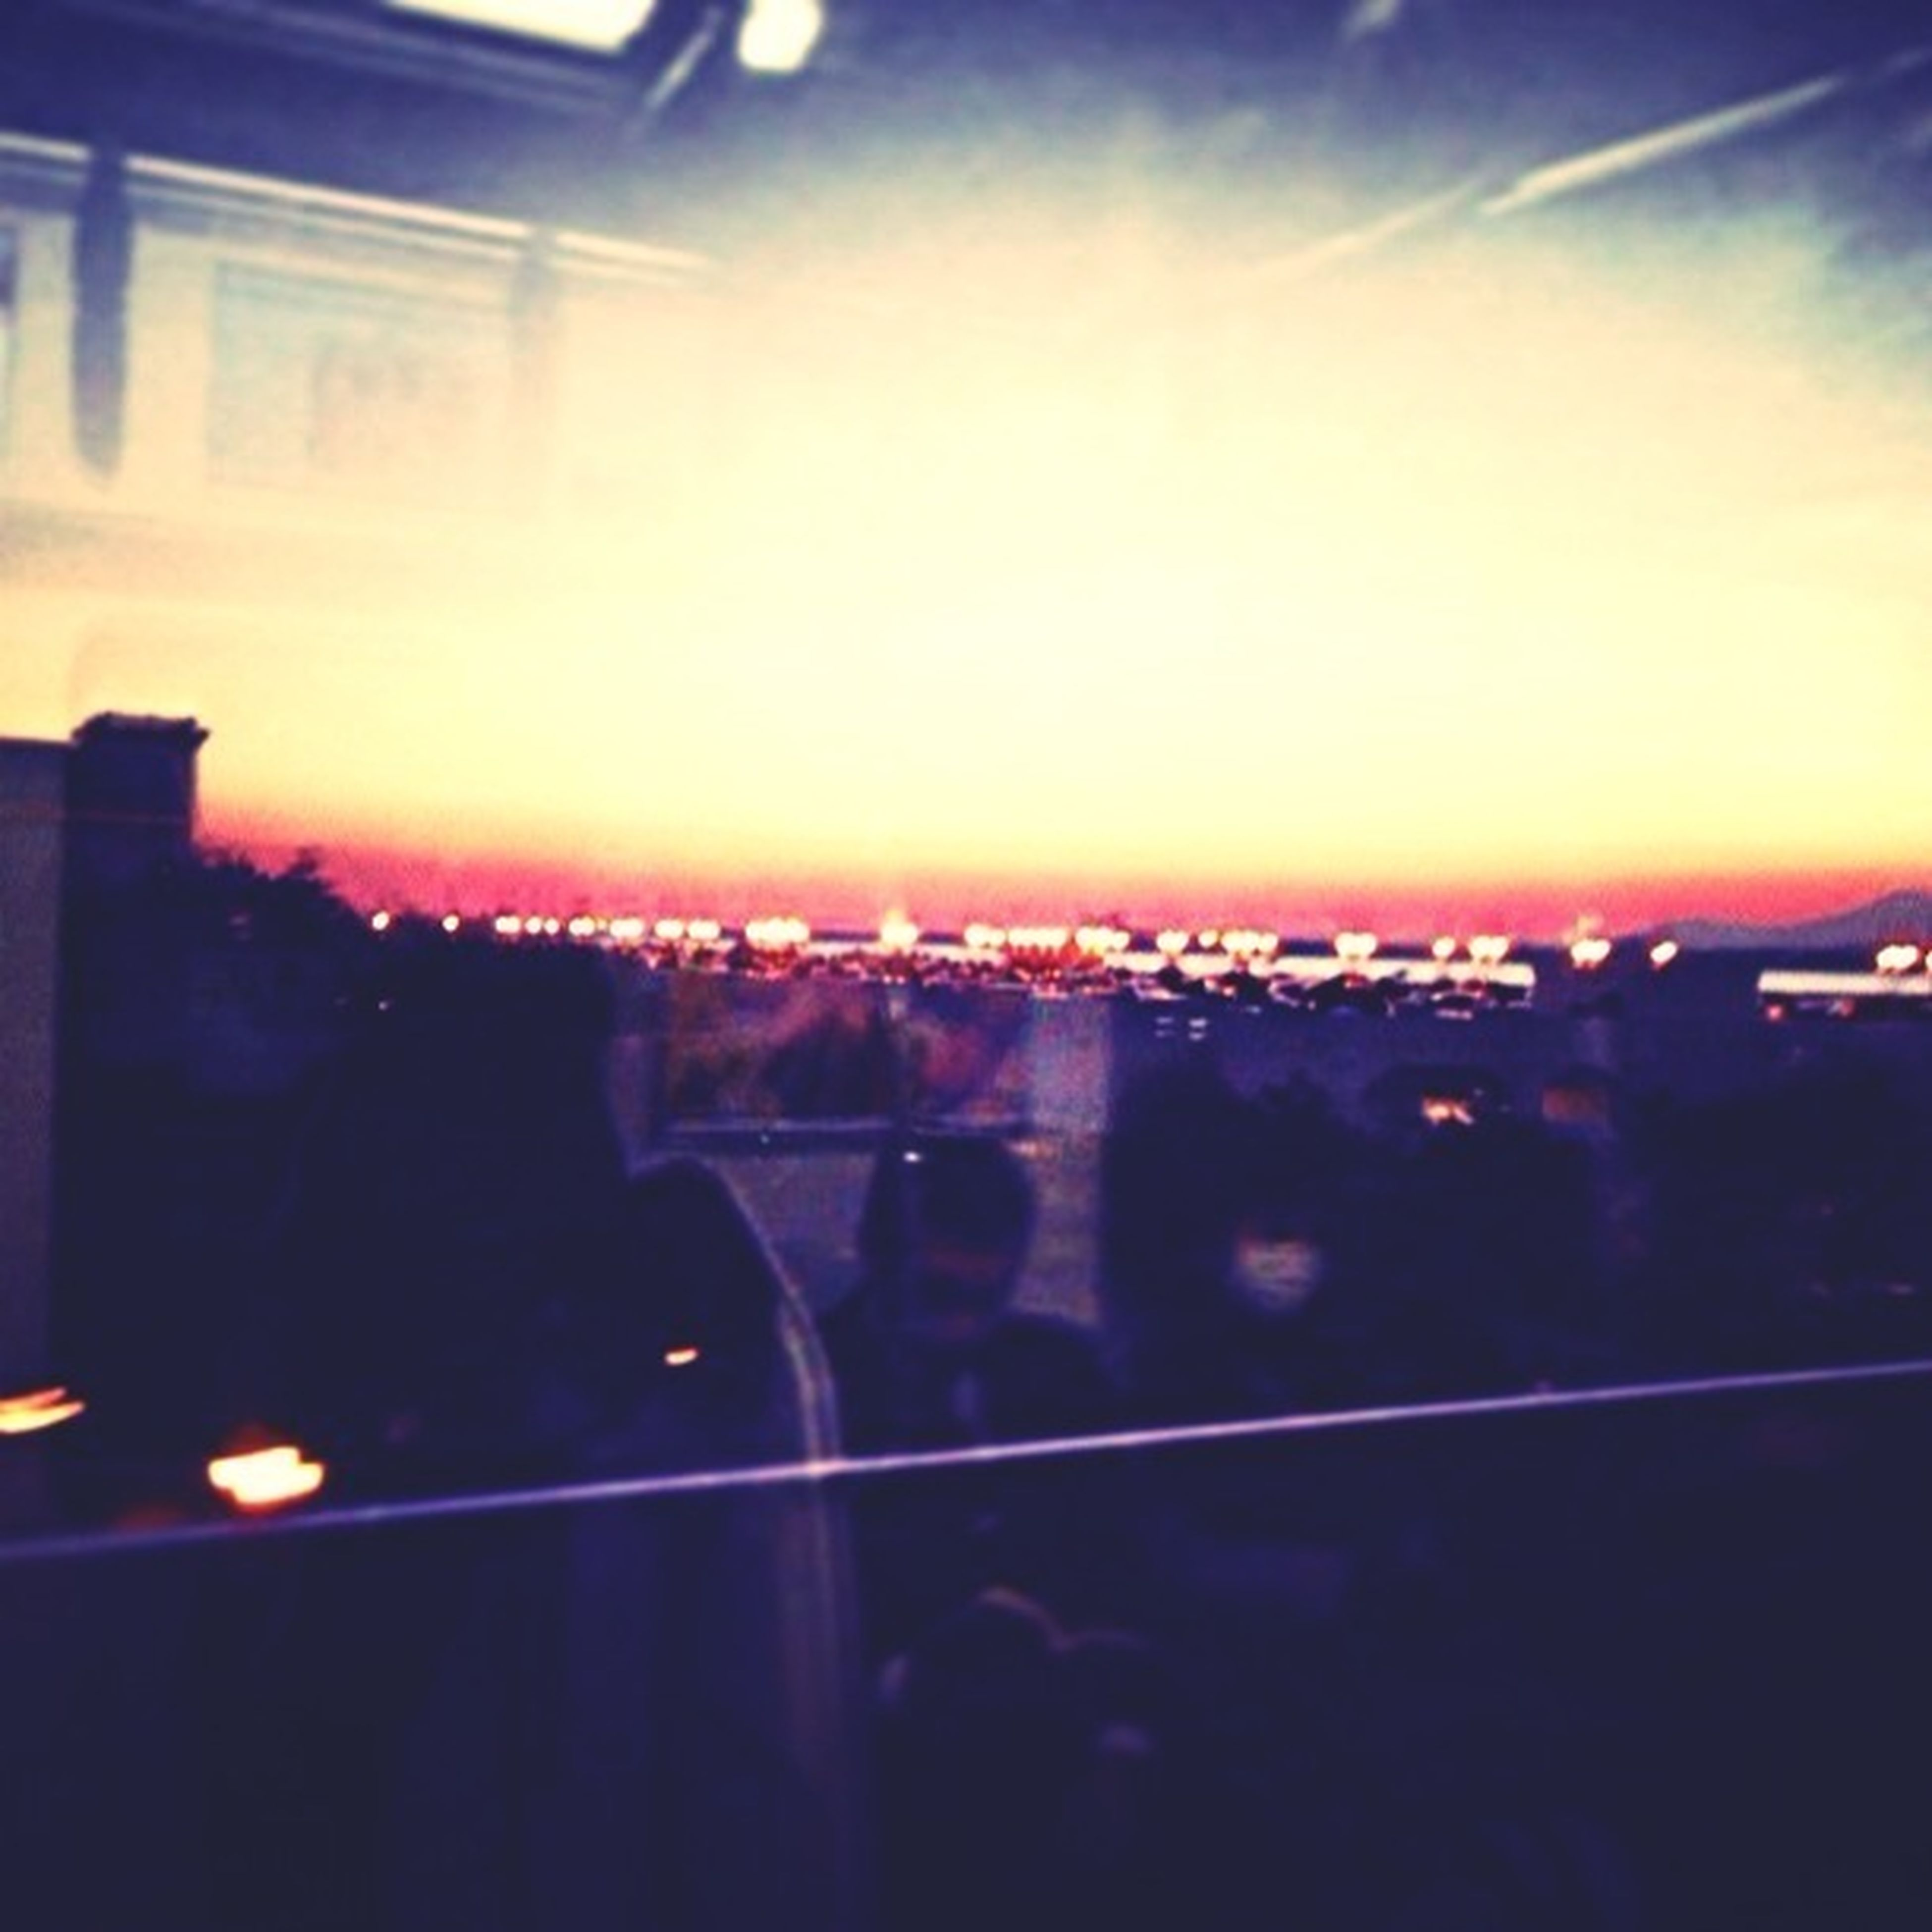 illuminated, sunset, city, building exterior, architecture, built structure, silhouette, cityscape, sky, orange color, night, lens flare, sun, city life, dusk, outdoors, no people, light - natural phenomenon, transportation